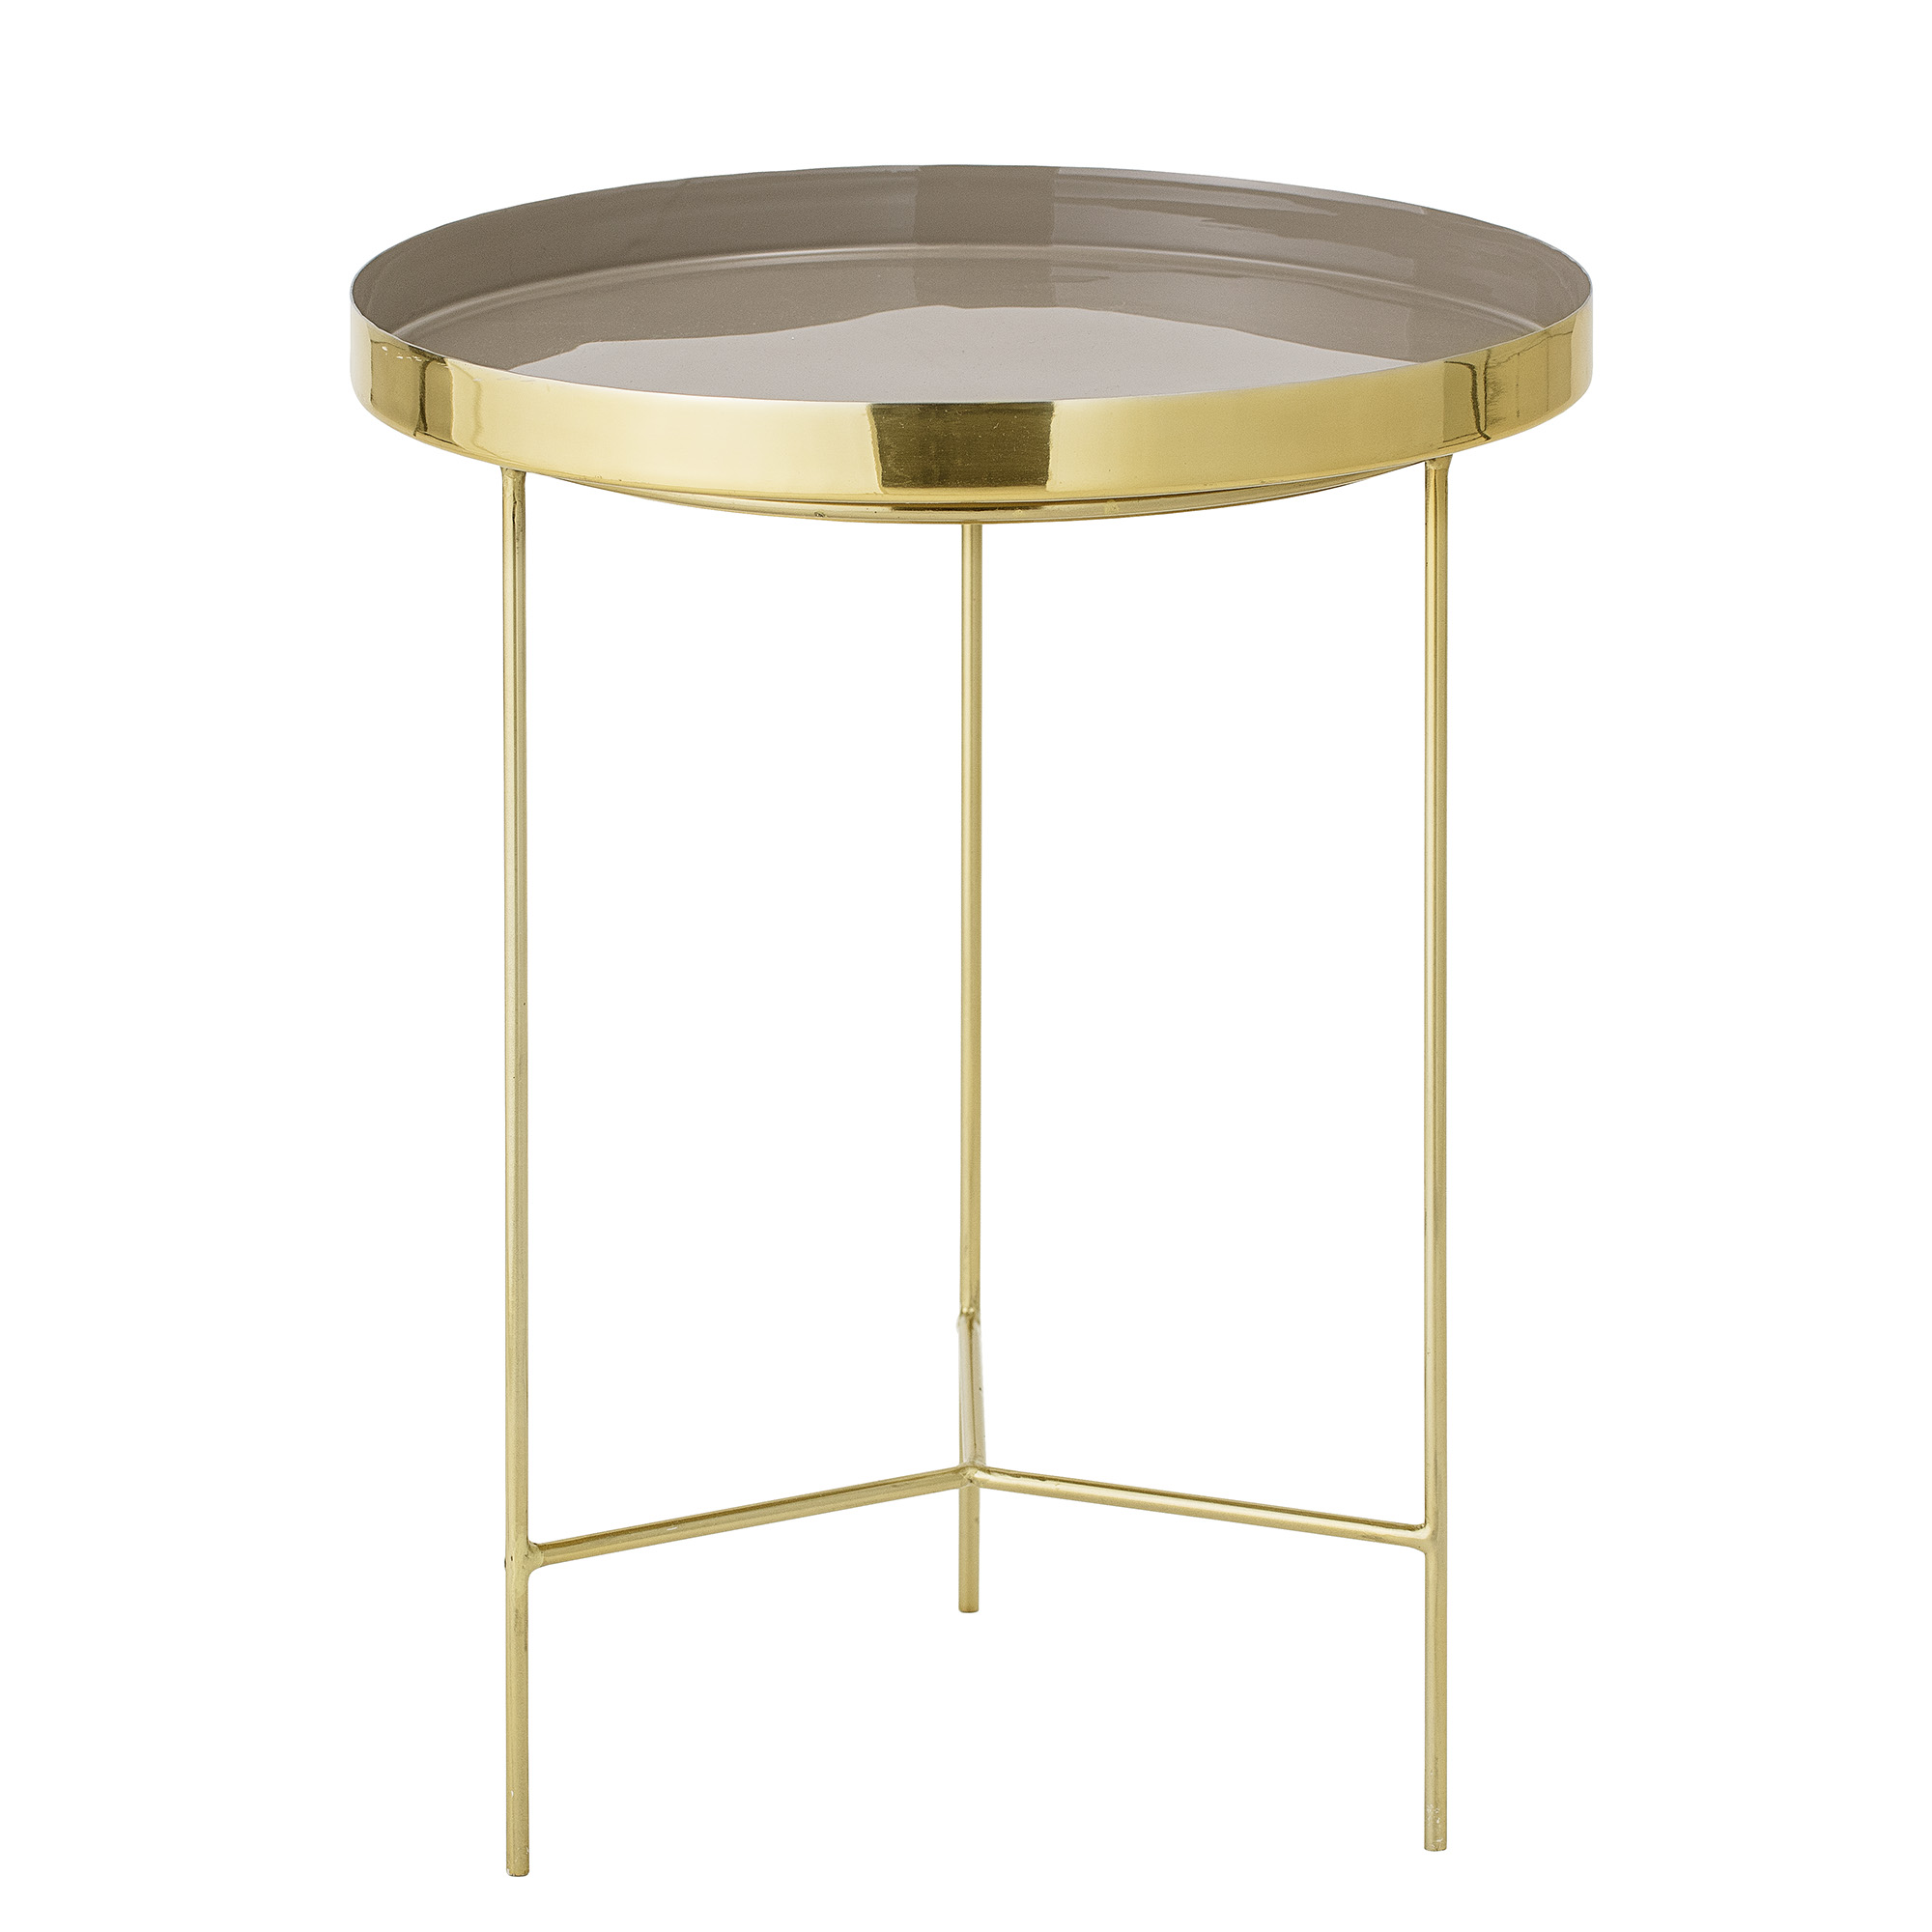 Bloomingville sola bakkebord - brun/guld aluminium/stål, rund (ø40) fra bloomingville fra boboonline.dk